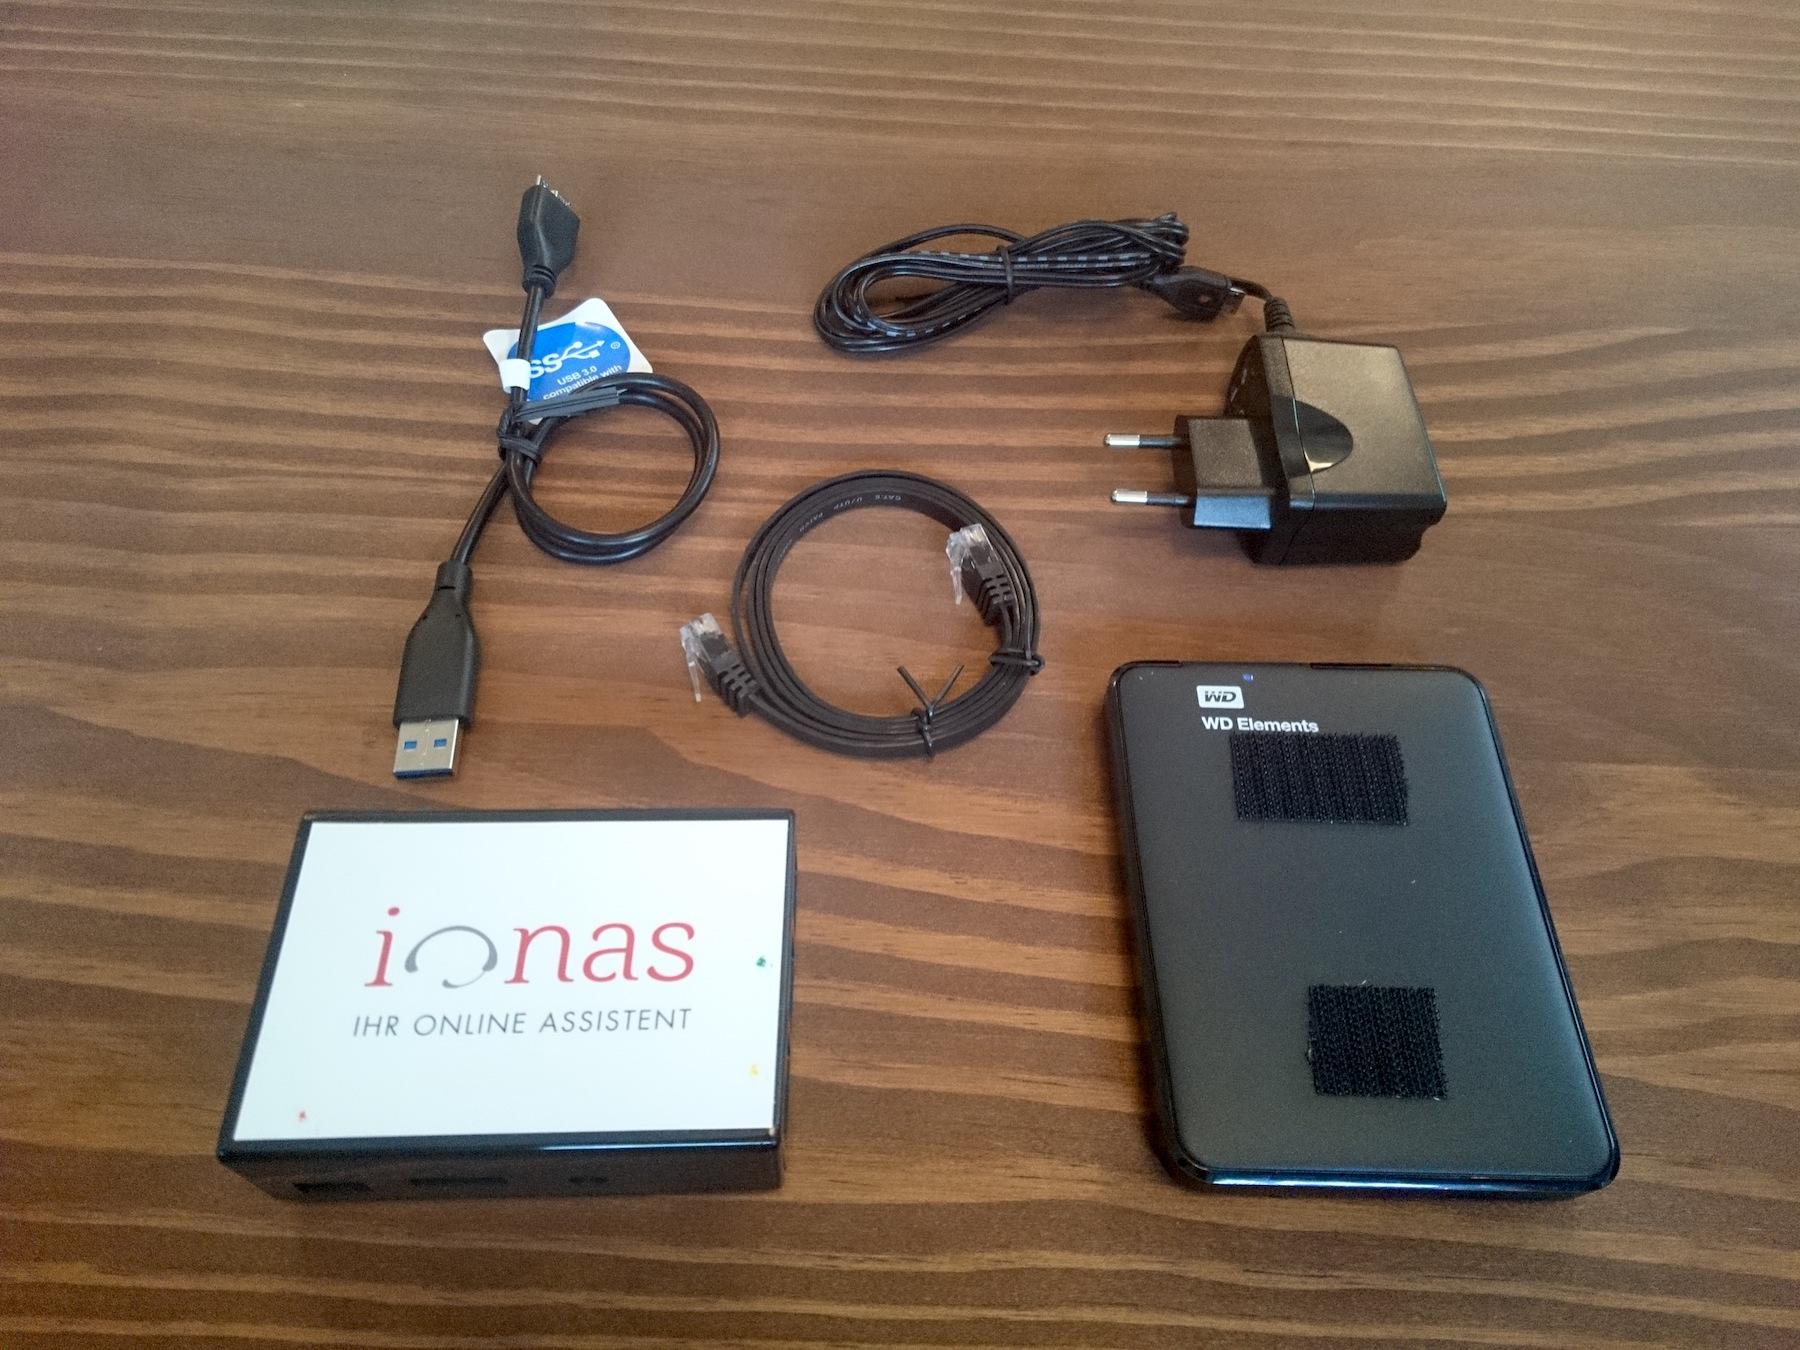 ionas-Server Home Zubehör